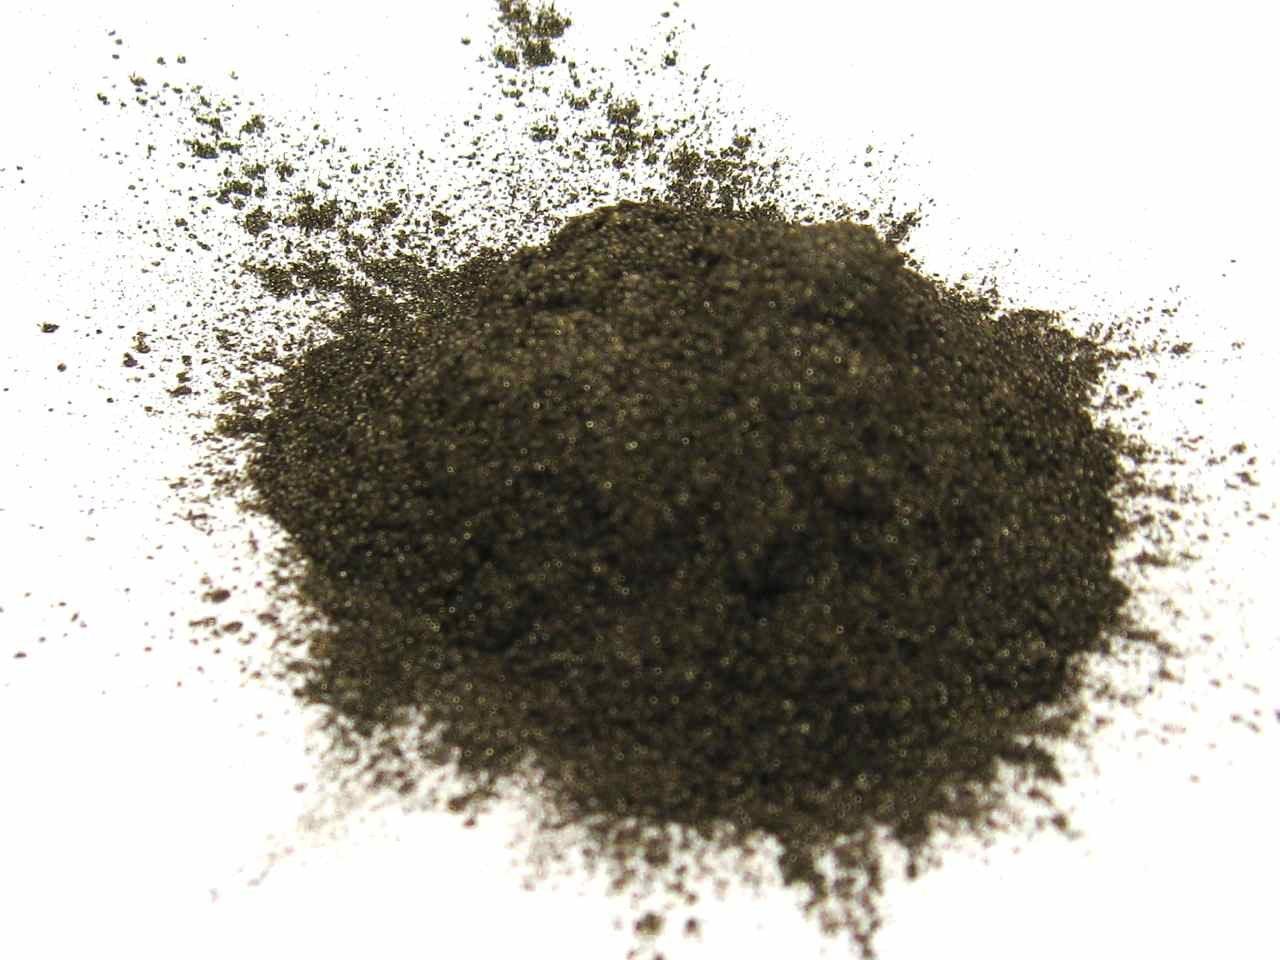 Fuscous Brown Mica Powder15 grams, Metallic Brown Powder, Cosmetic Mica Powder for Lipsticks, Lip Balm, Bath bombs and More, Slice of the Moon EKS Entertainment Group